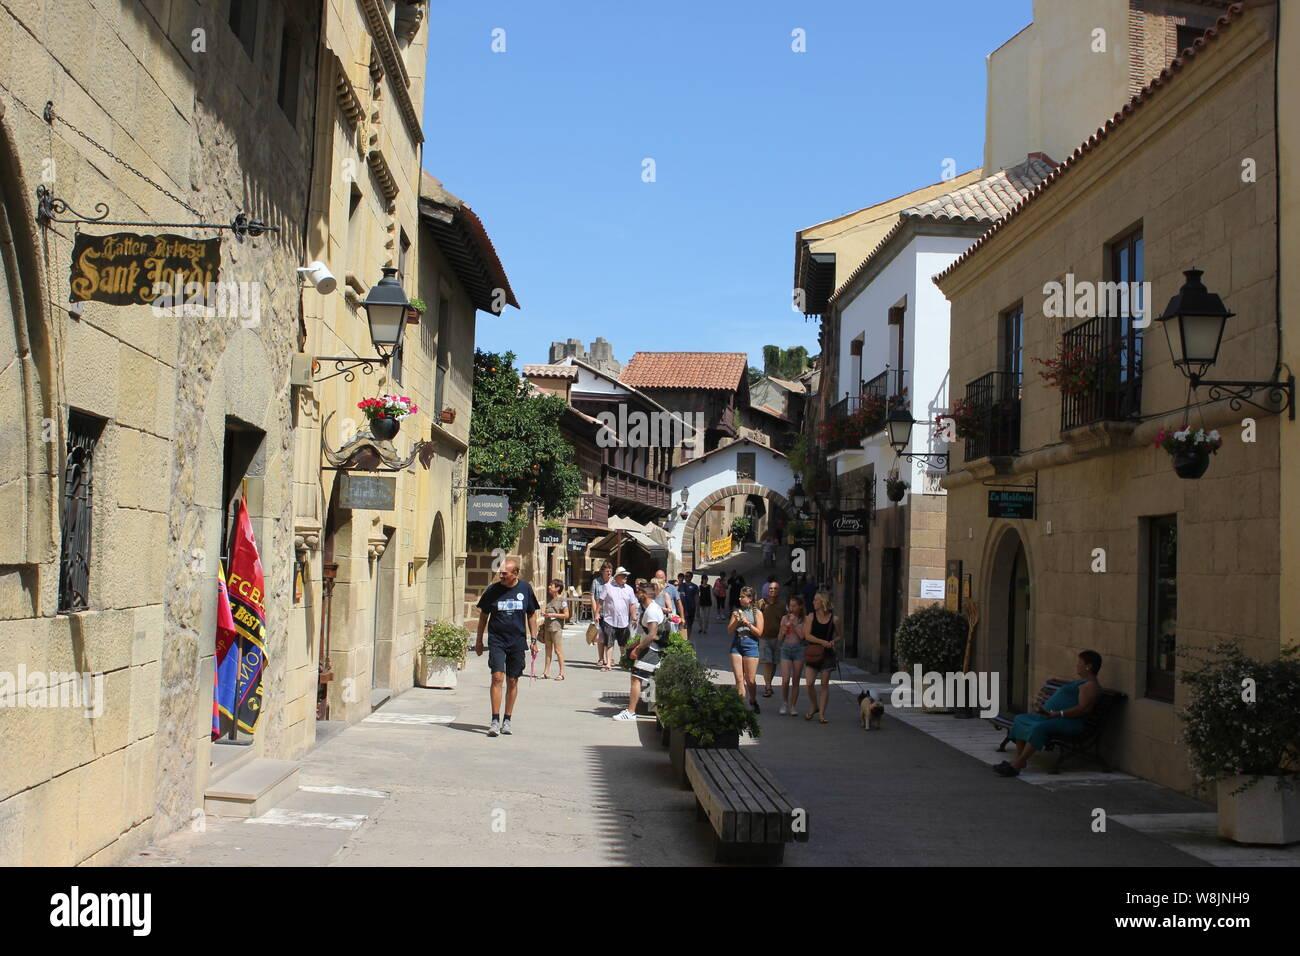 Spanish village , Poble Espanyol , The open air museum complex Poble Espanyol Barcelona Spain Stock Photo